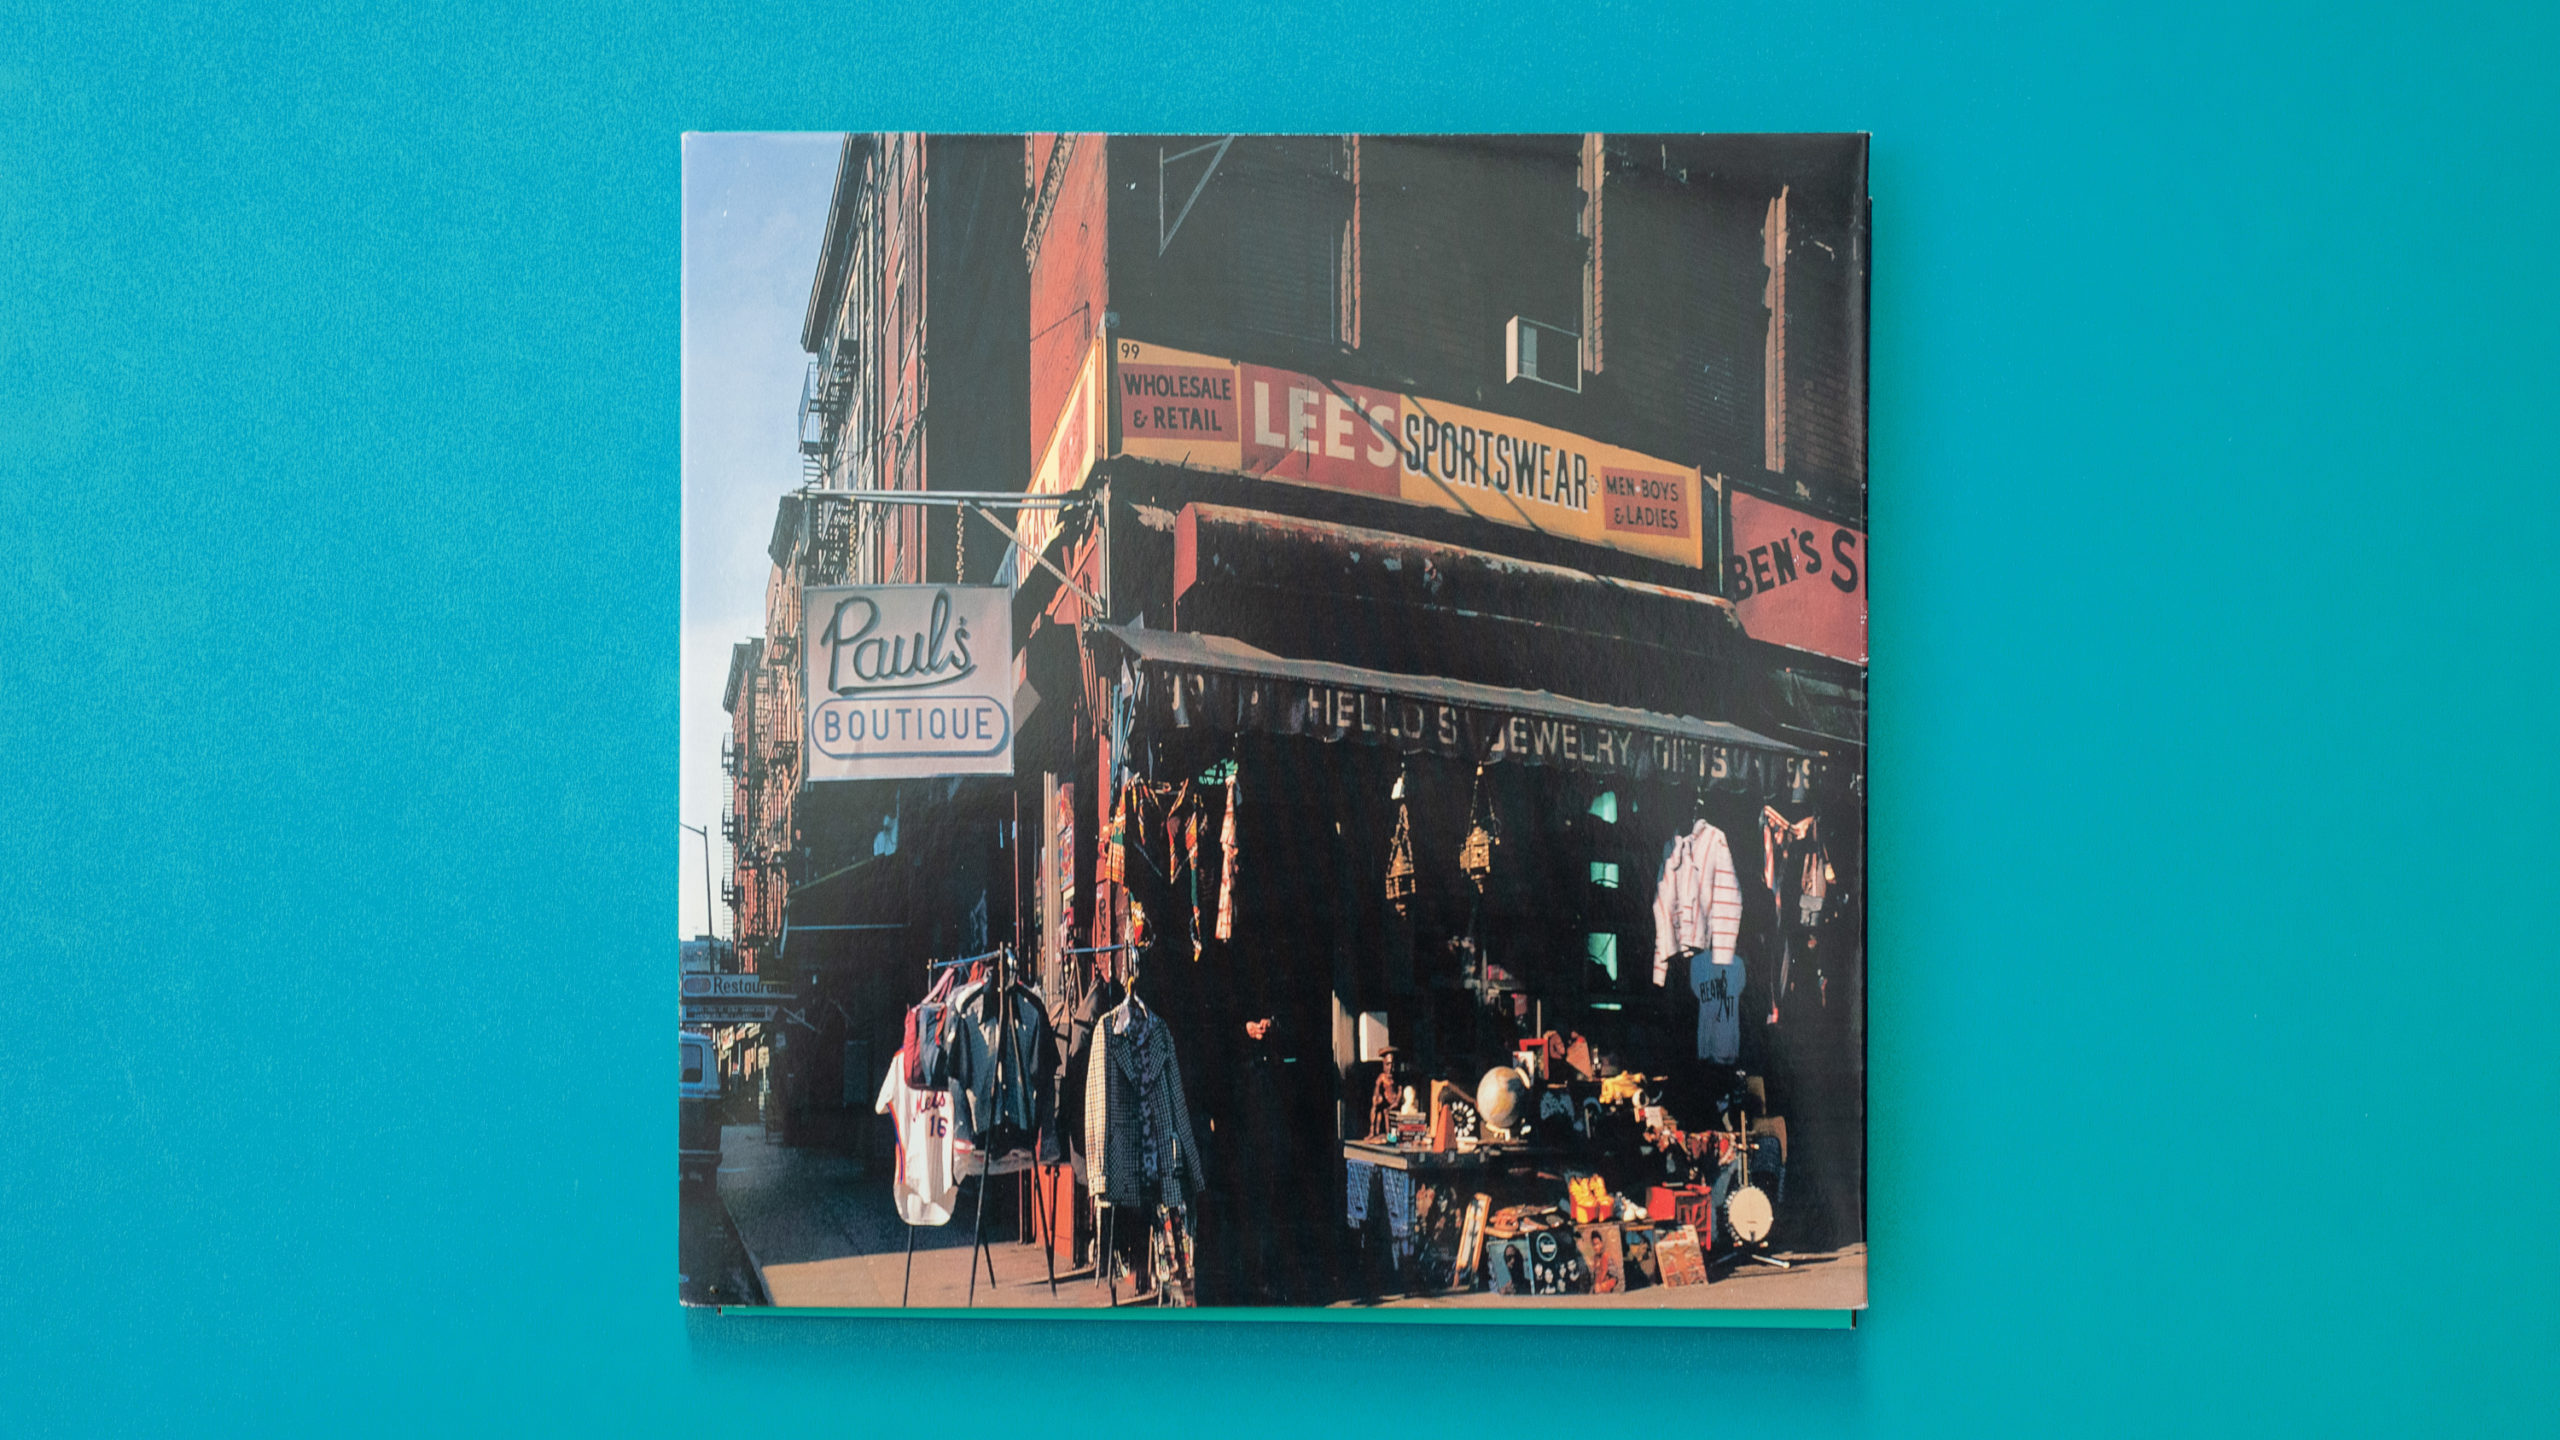 Album cover for the Beastie Boy's album called Paul's Boutique